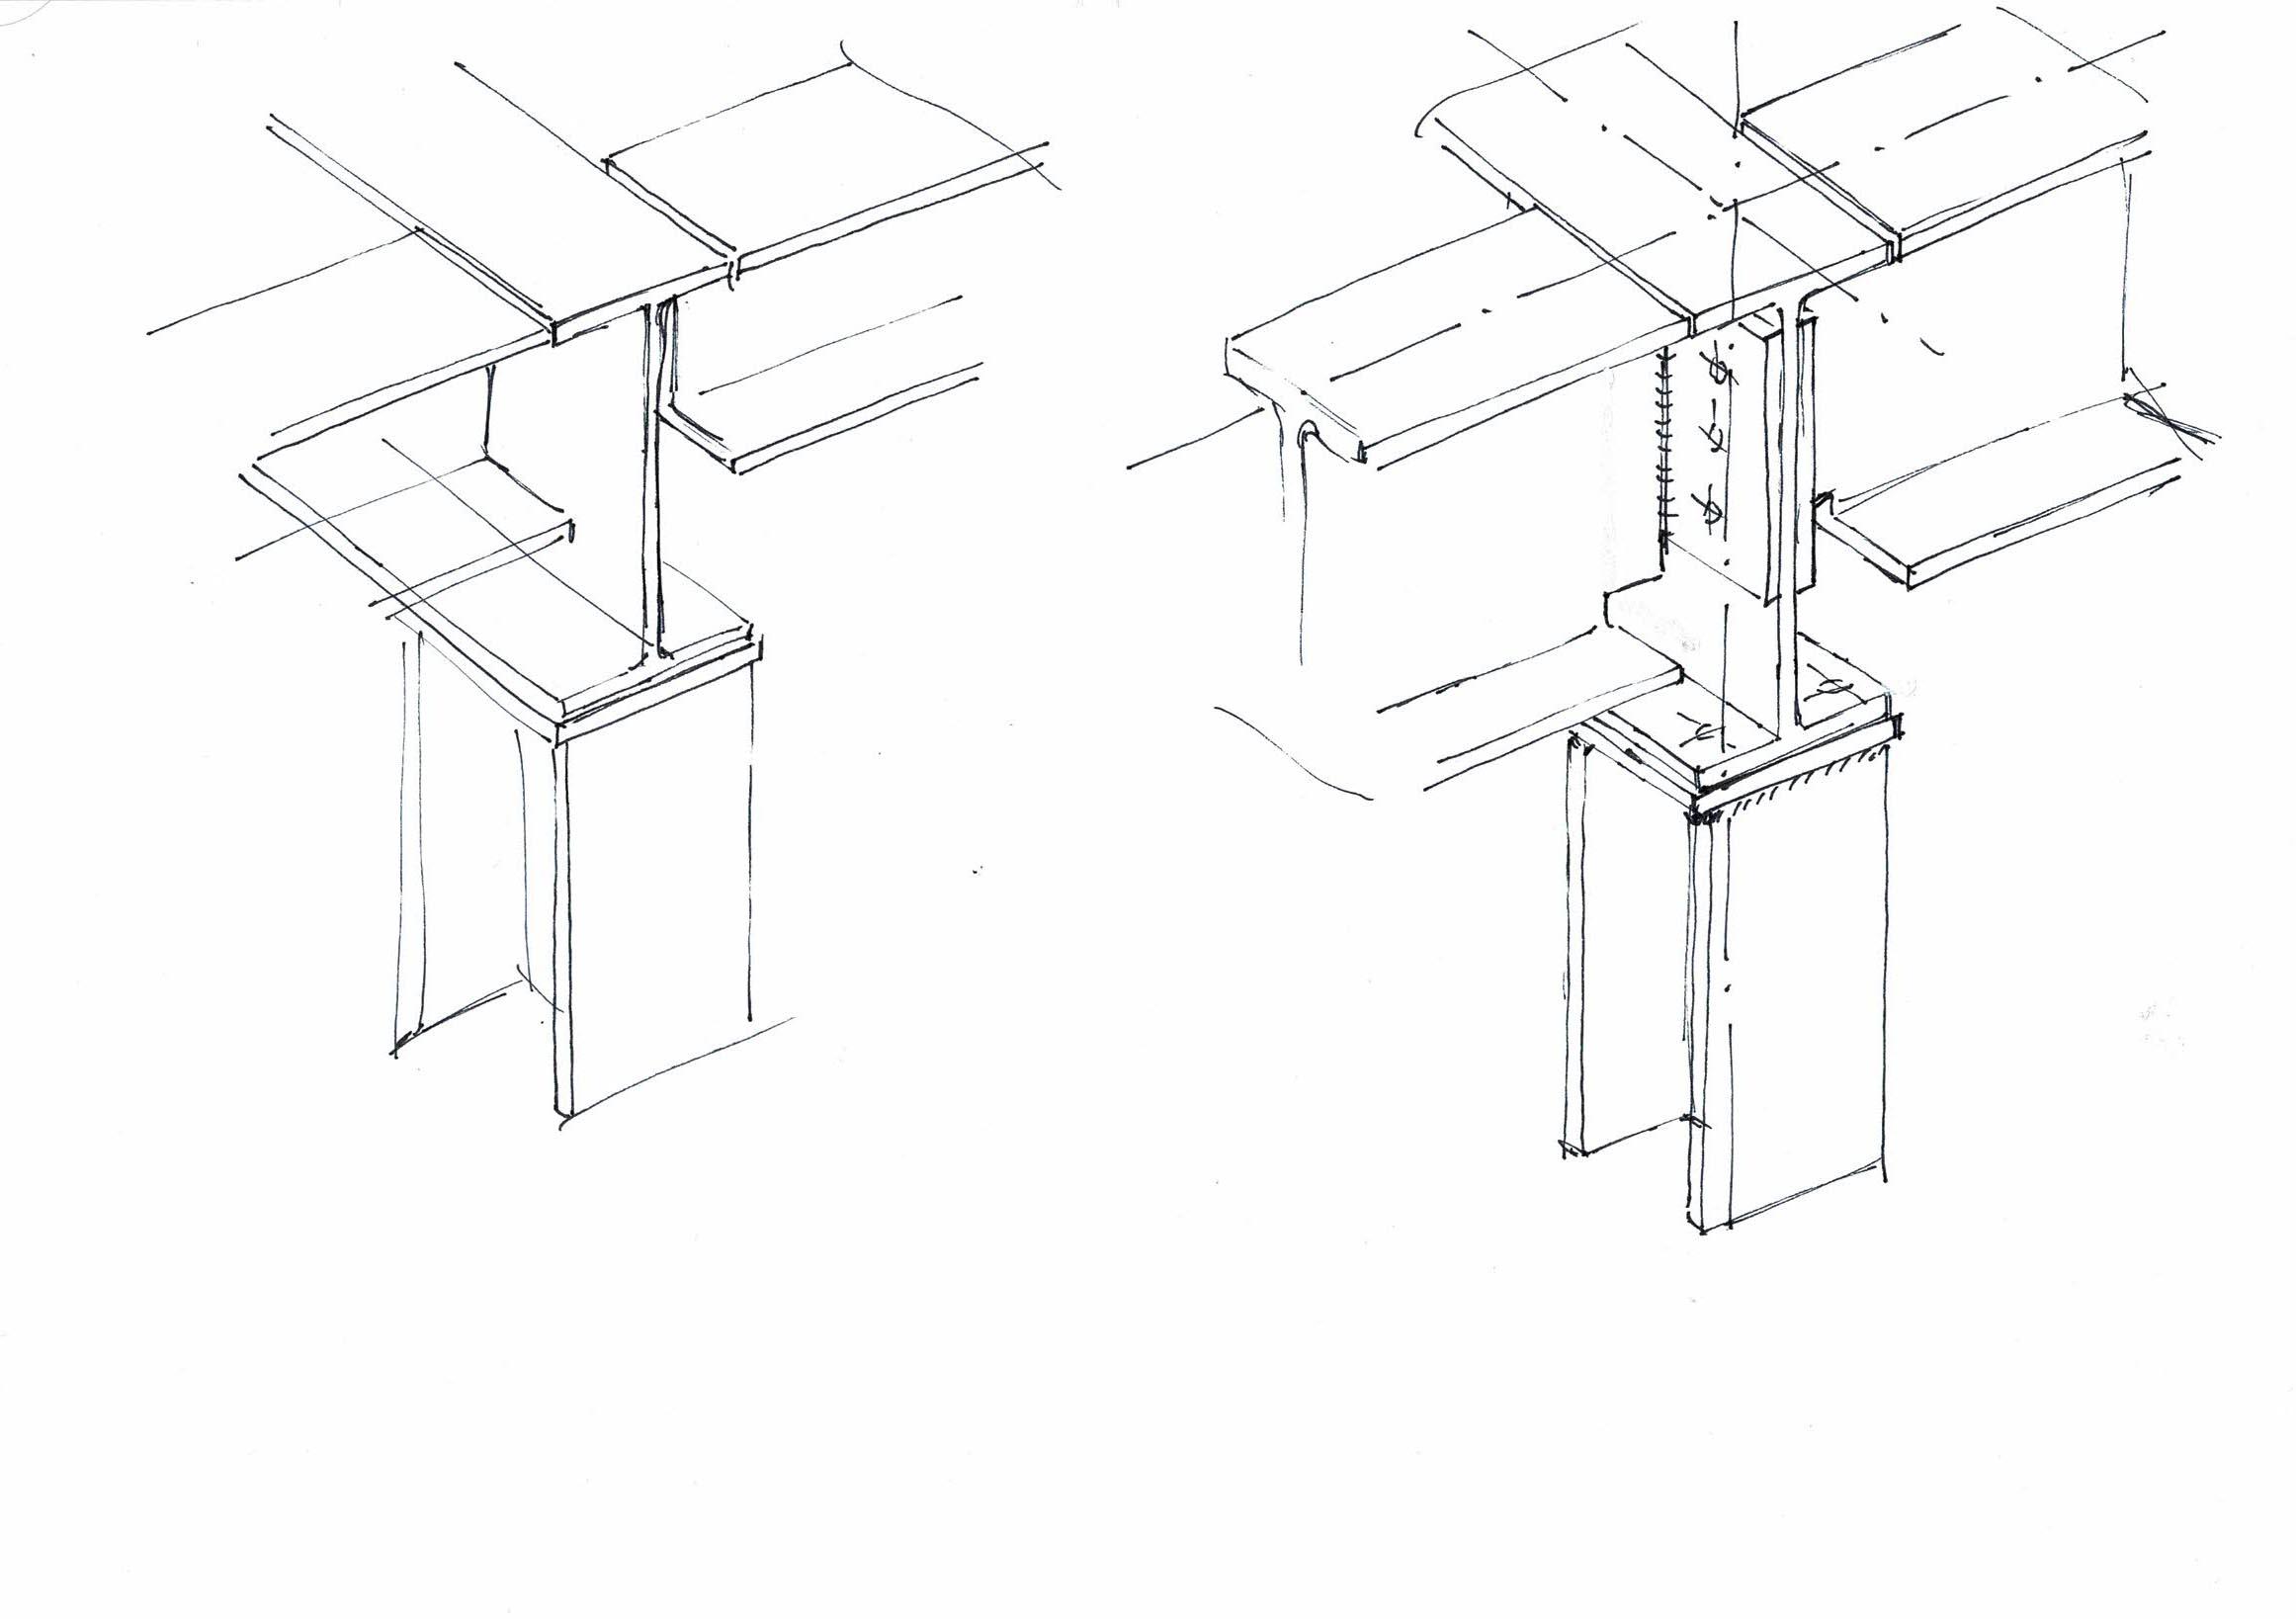 180308 - Perimeter Steelwork Connection Sketch.jpg